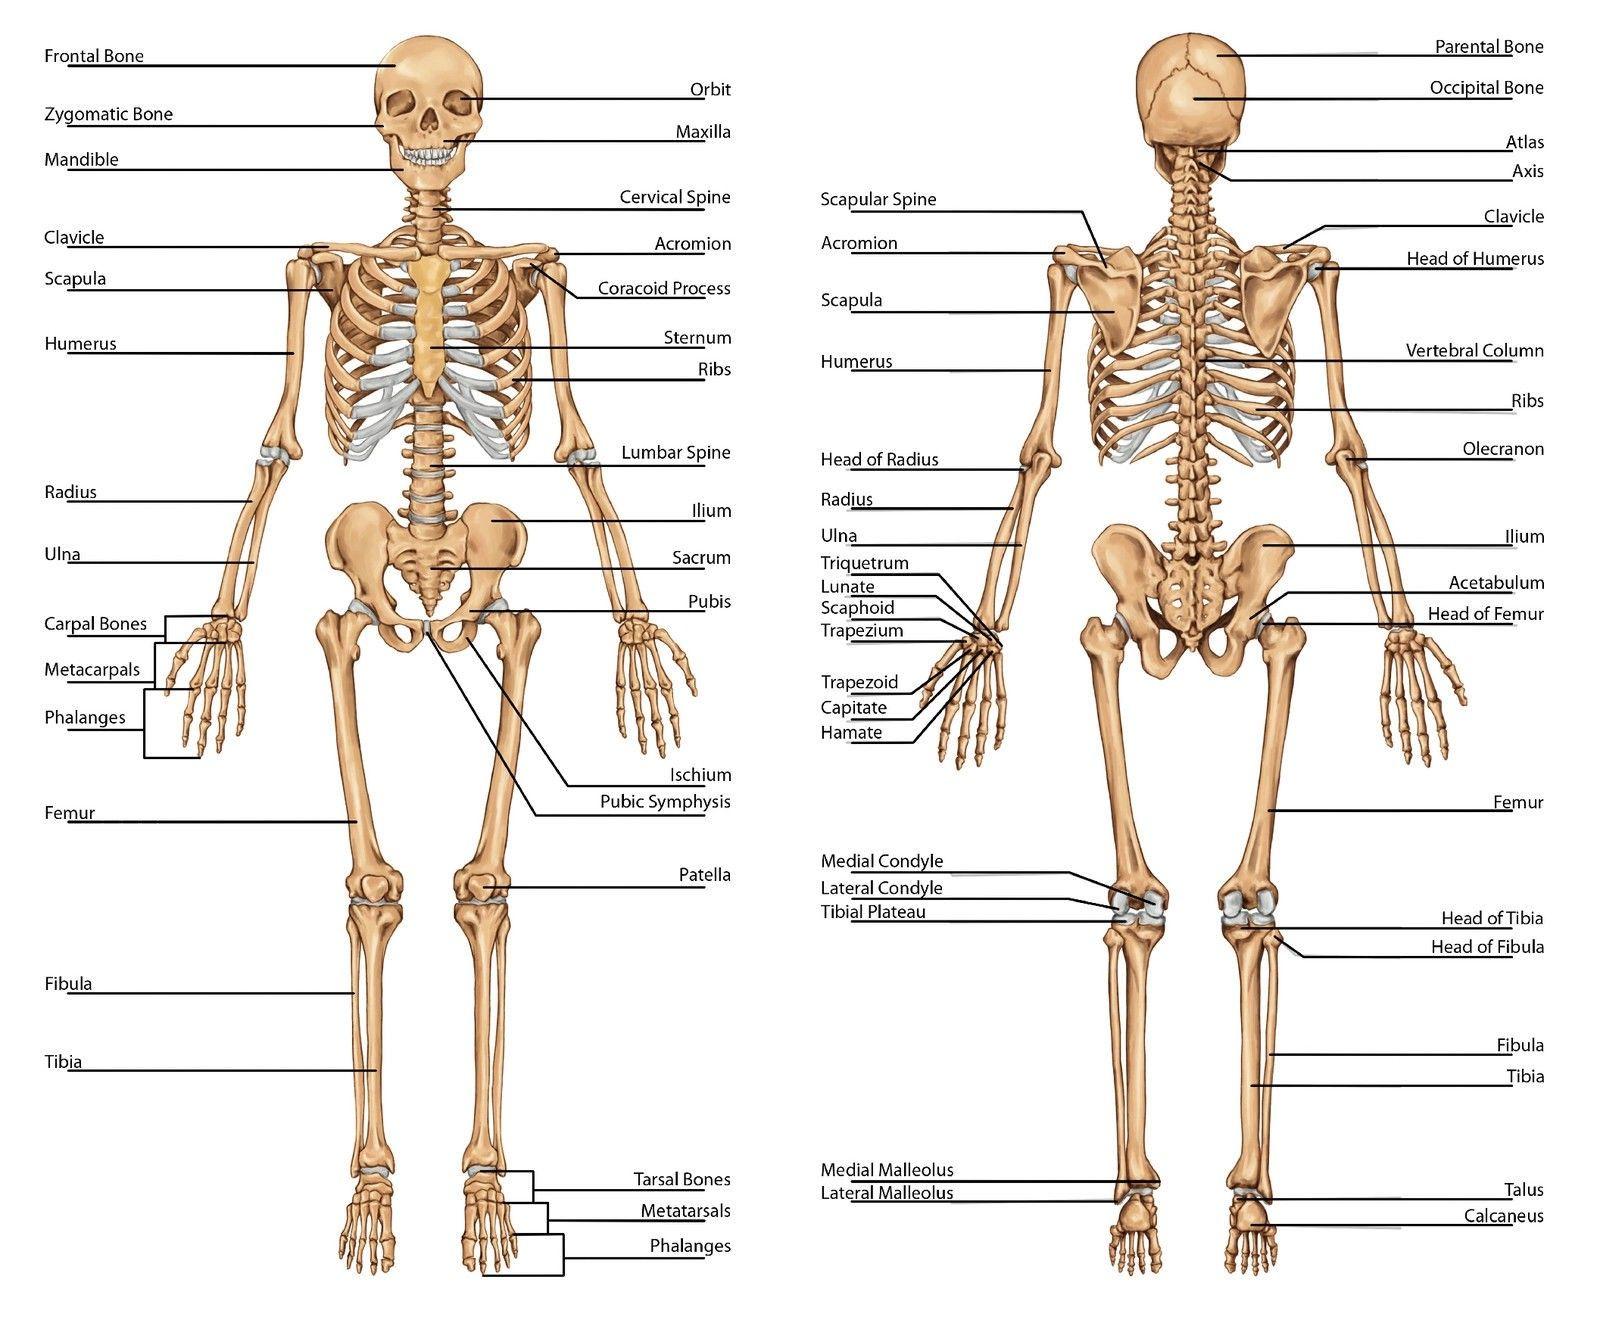 medium resolution of diagram of the human body skeleton inspirational skeleton anatomy rh pinterest fr human skeleton diagram human bone structure diagram